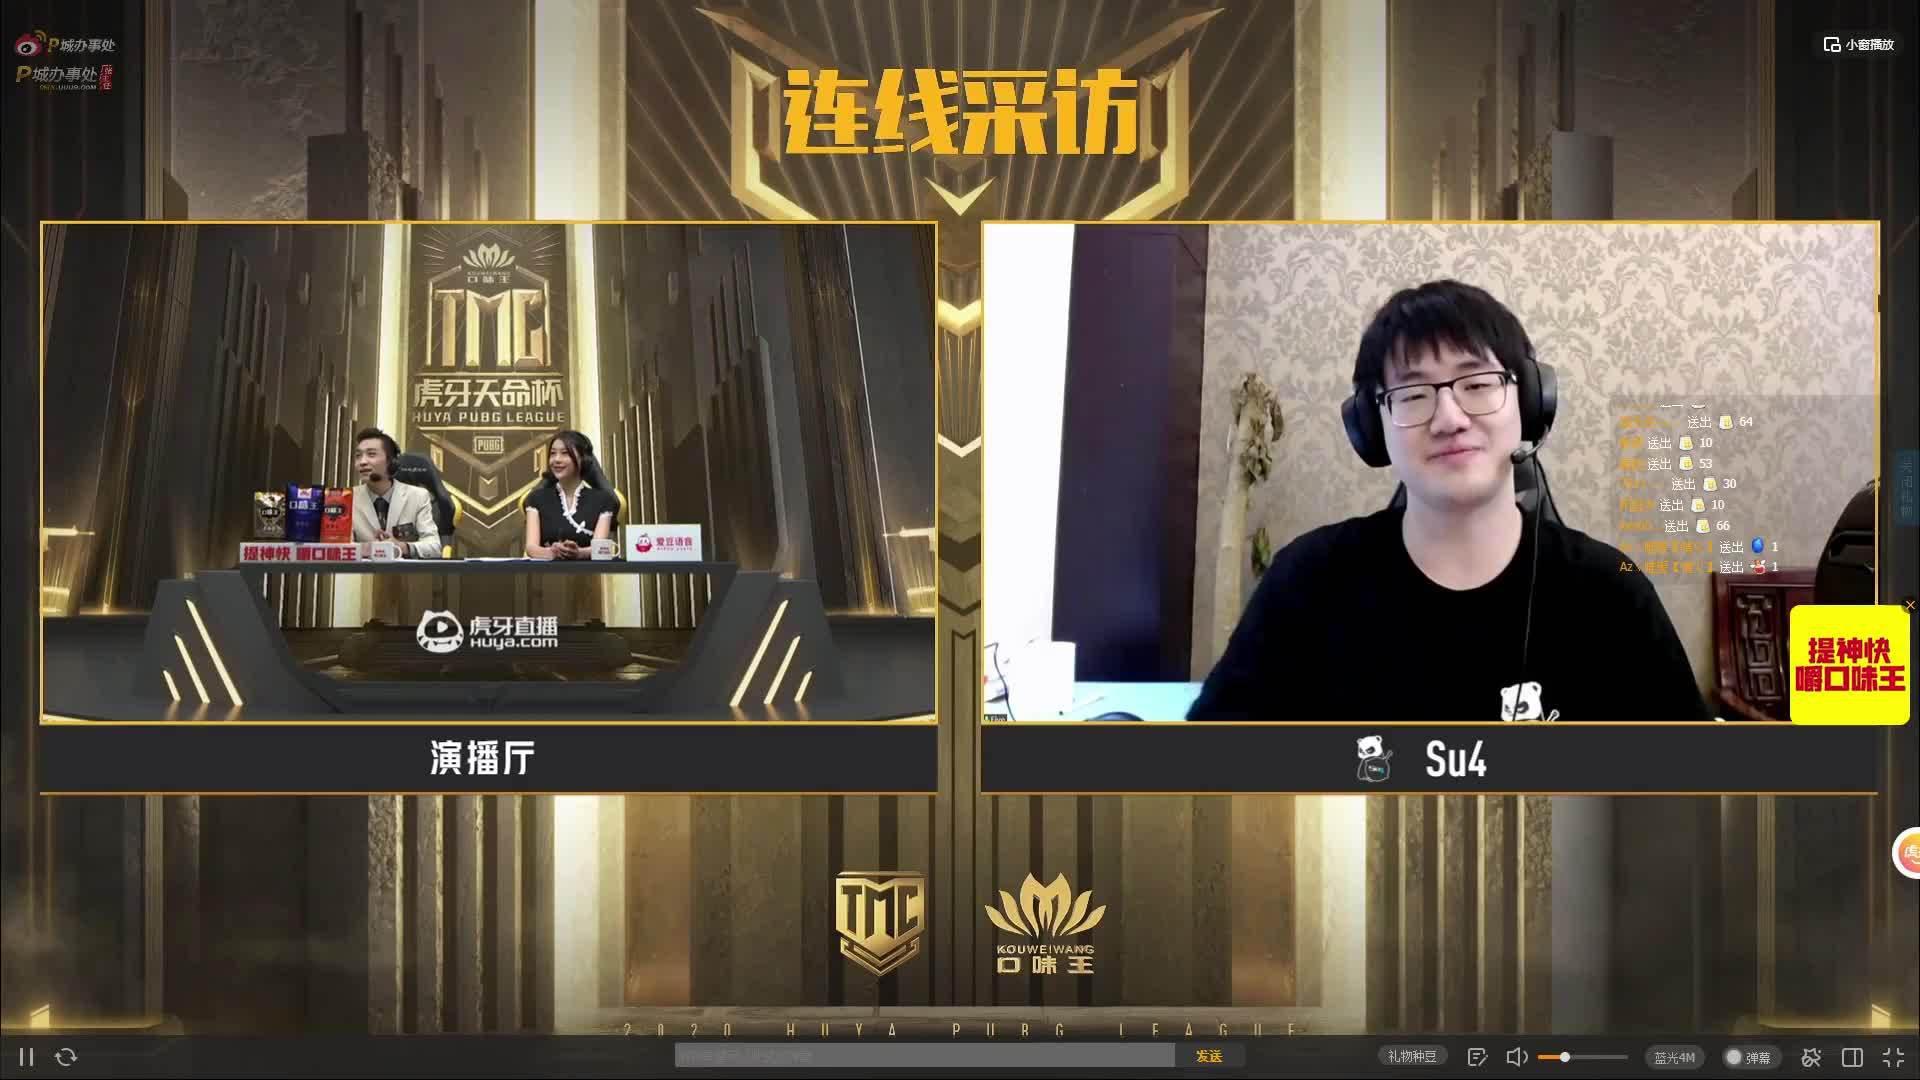 小组赛Day5 赛后采访 @Su4电子竞技俱乐部 chefufu队员